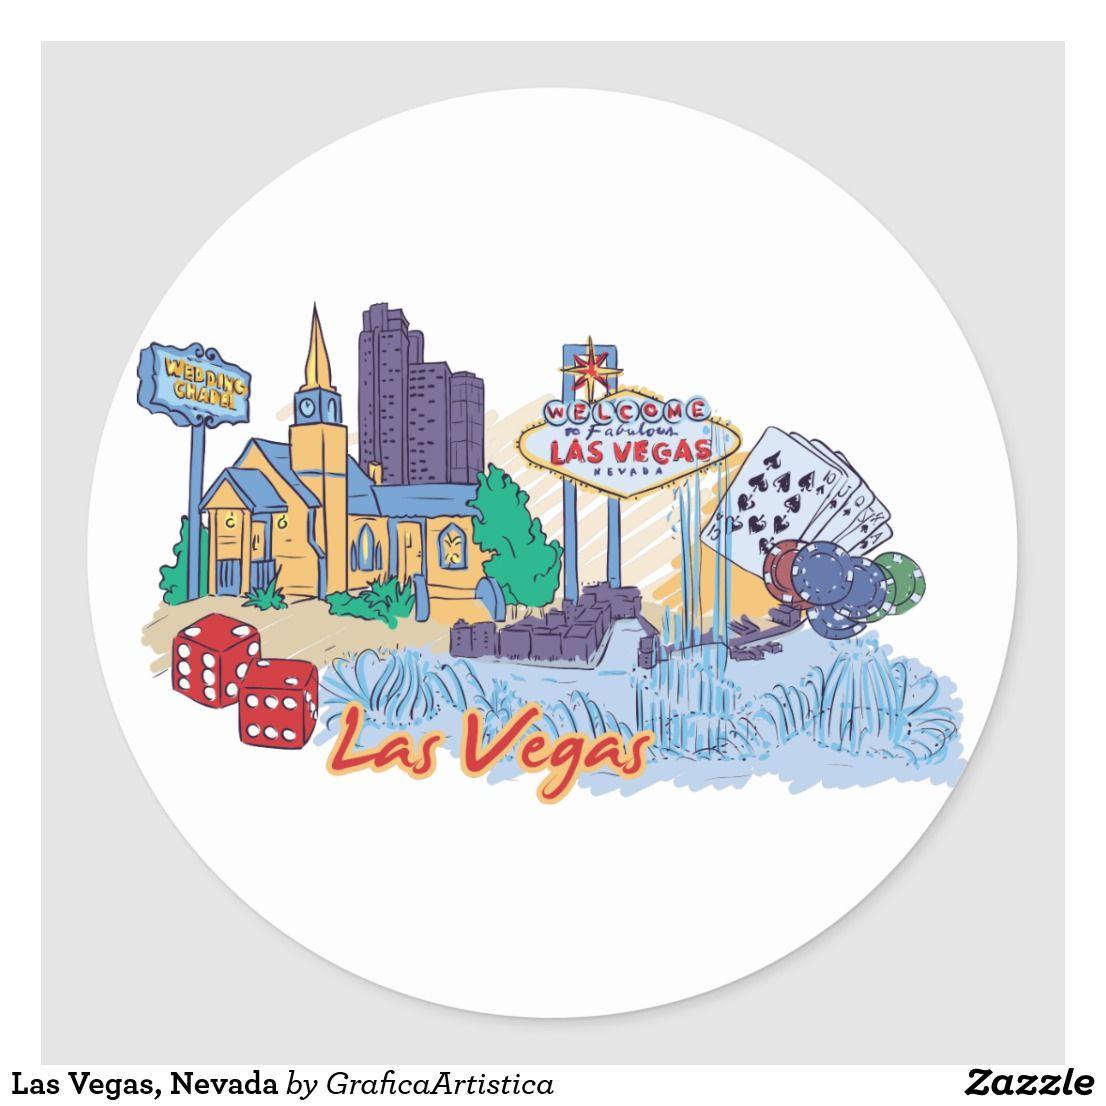 Las Vegas Nevada Classic Round Sticker Zazzle Com In 2021 Work Stickers Las Vegas Round Stickers [ 1106 x 1106 Pixel ]